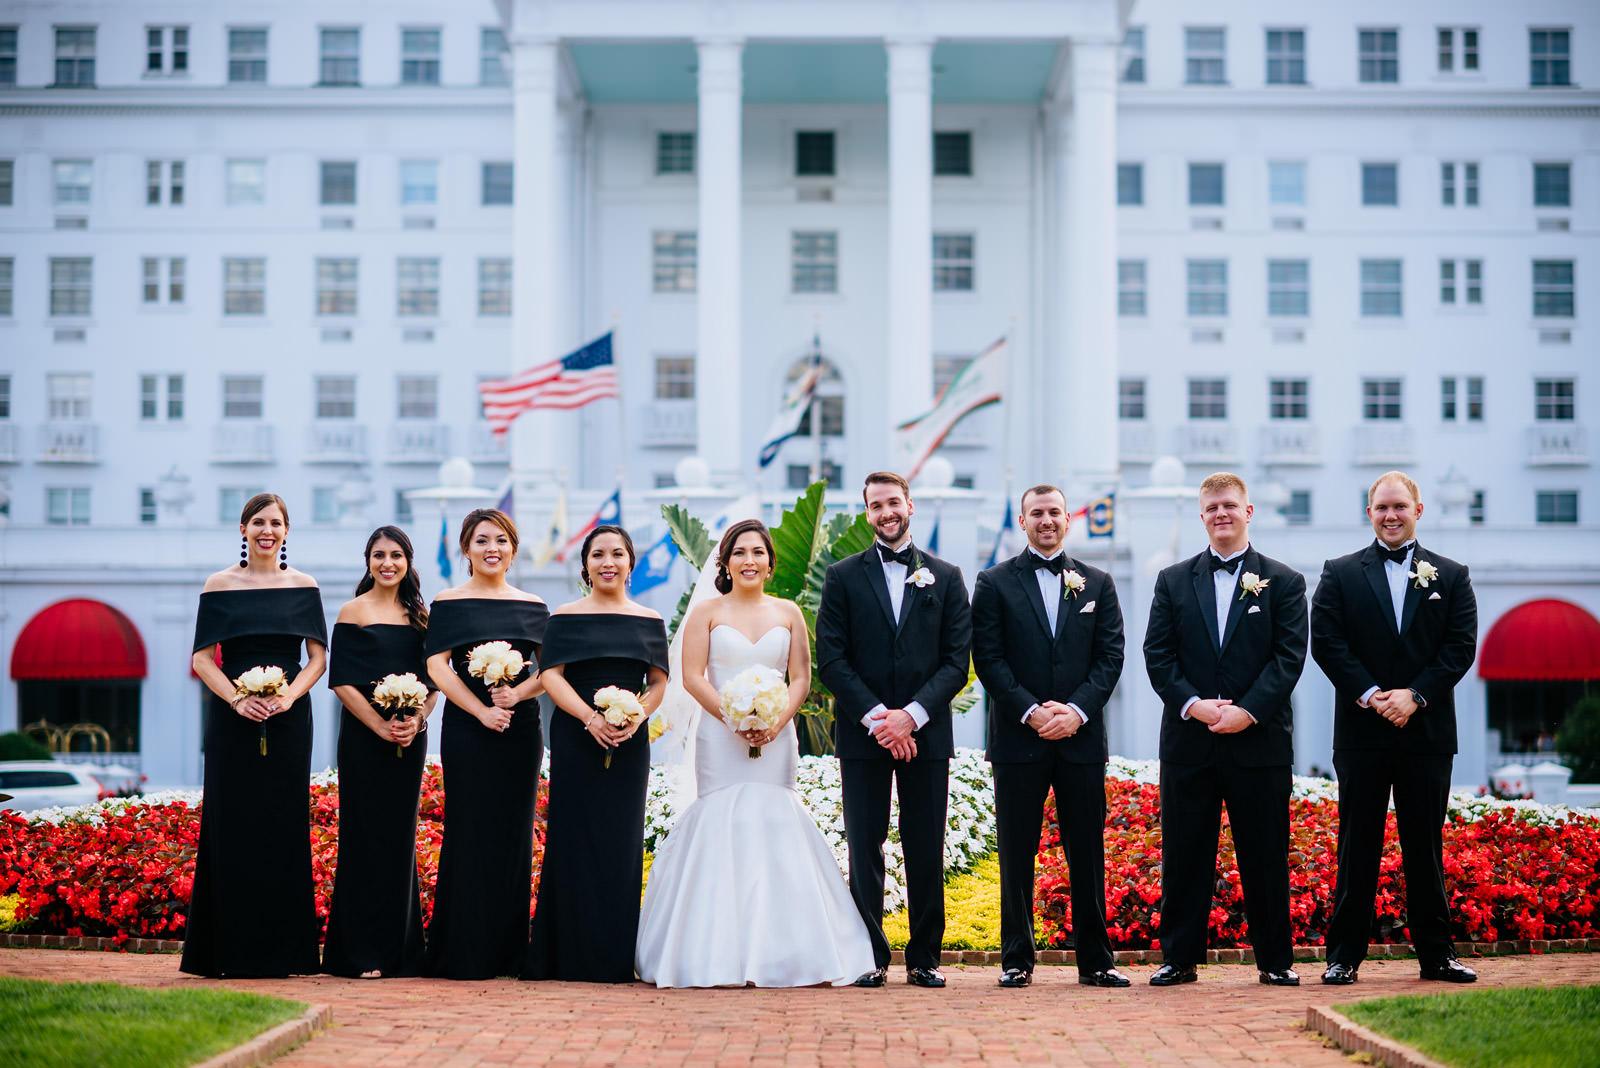 wedding party photos greenbrier resort